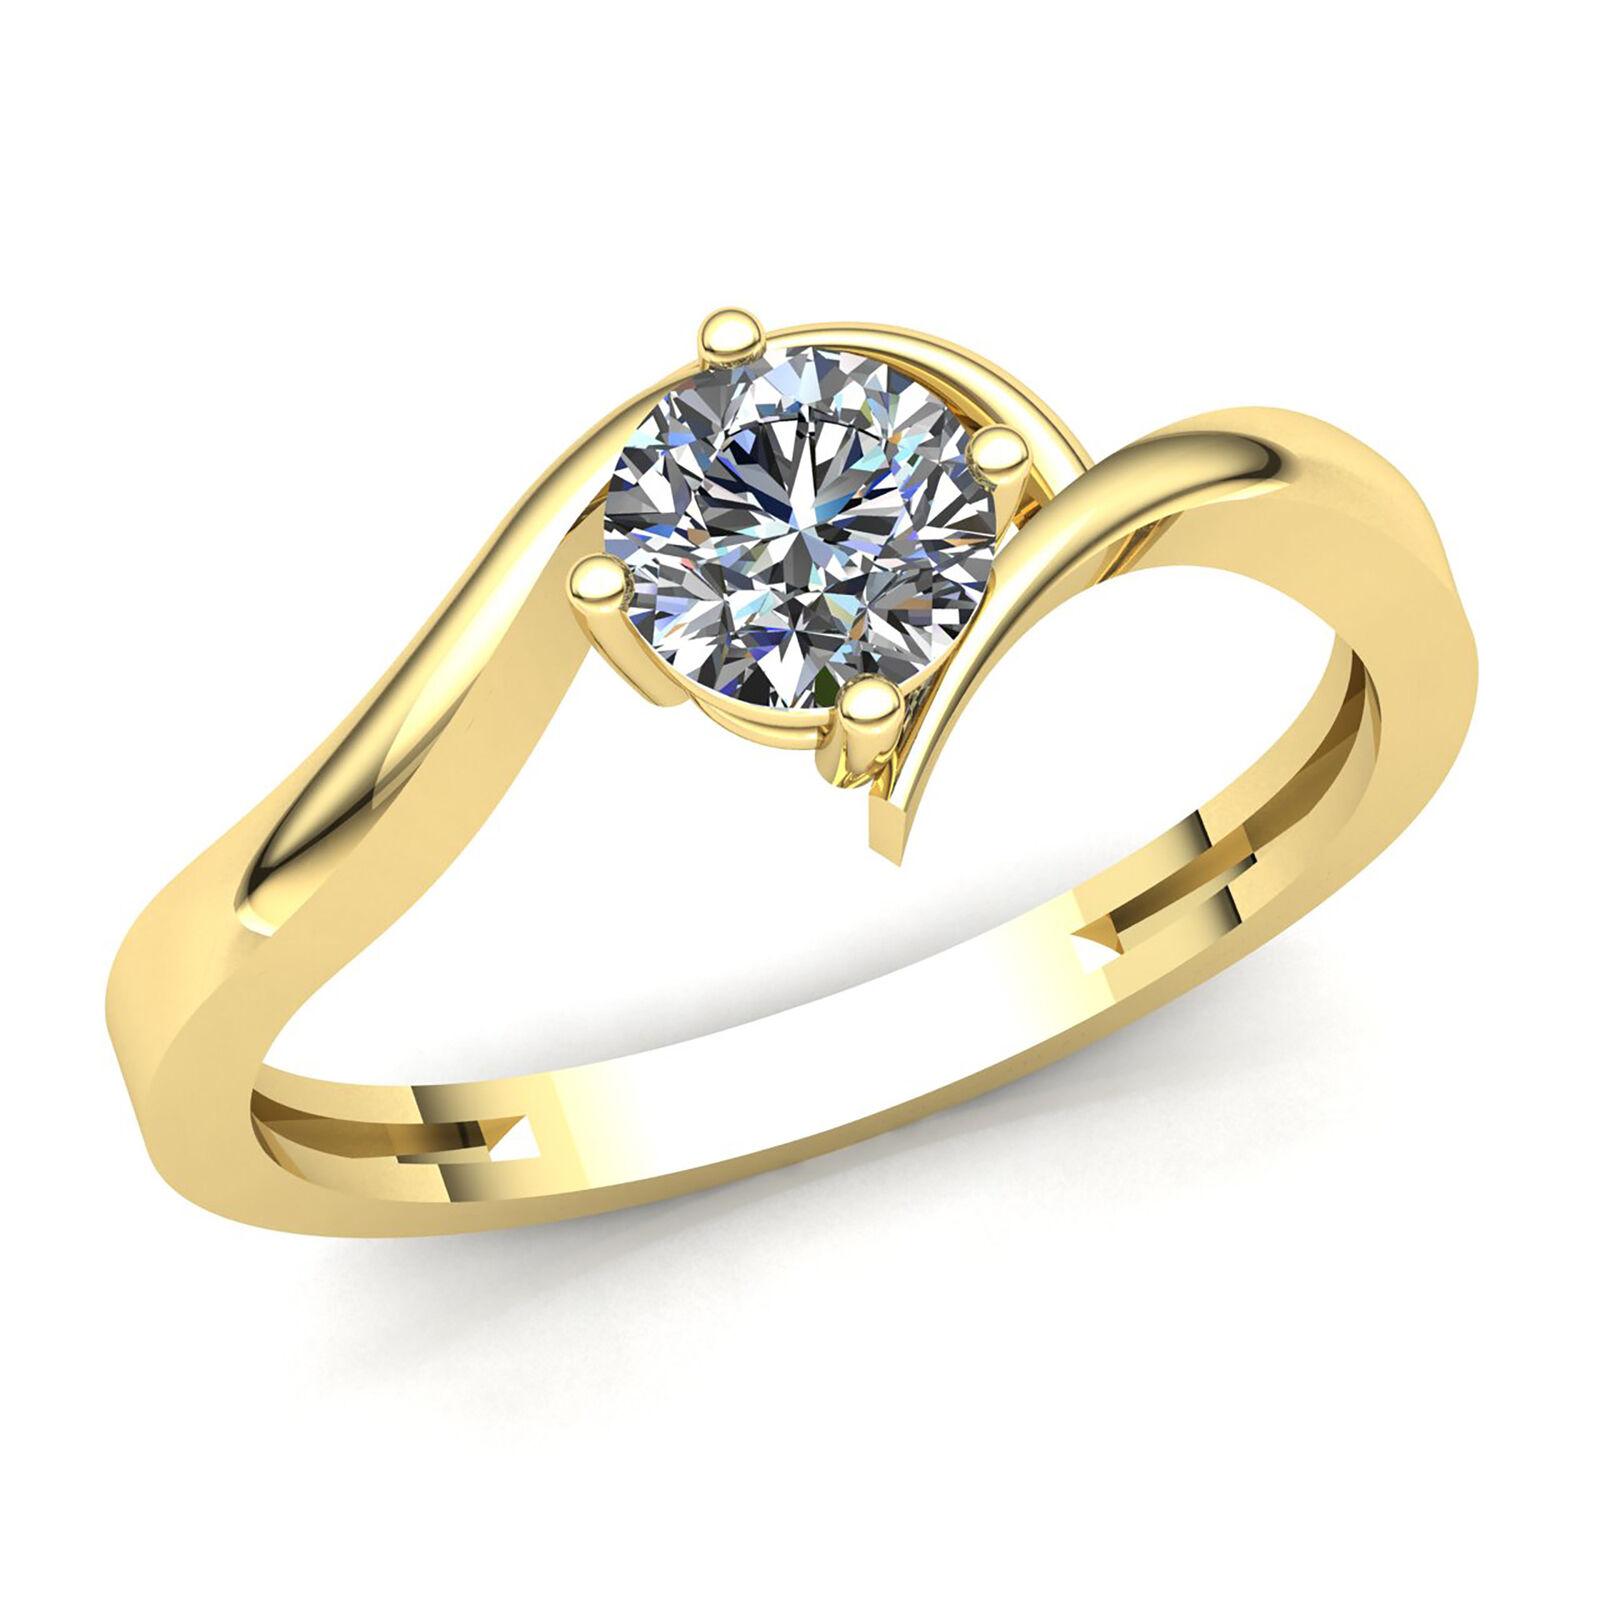 Natural 0.33carat Round Diamond Ladies Bridal Solitaire Engagement Ring 18K gold